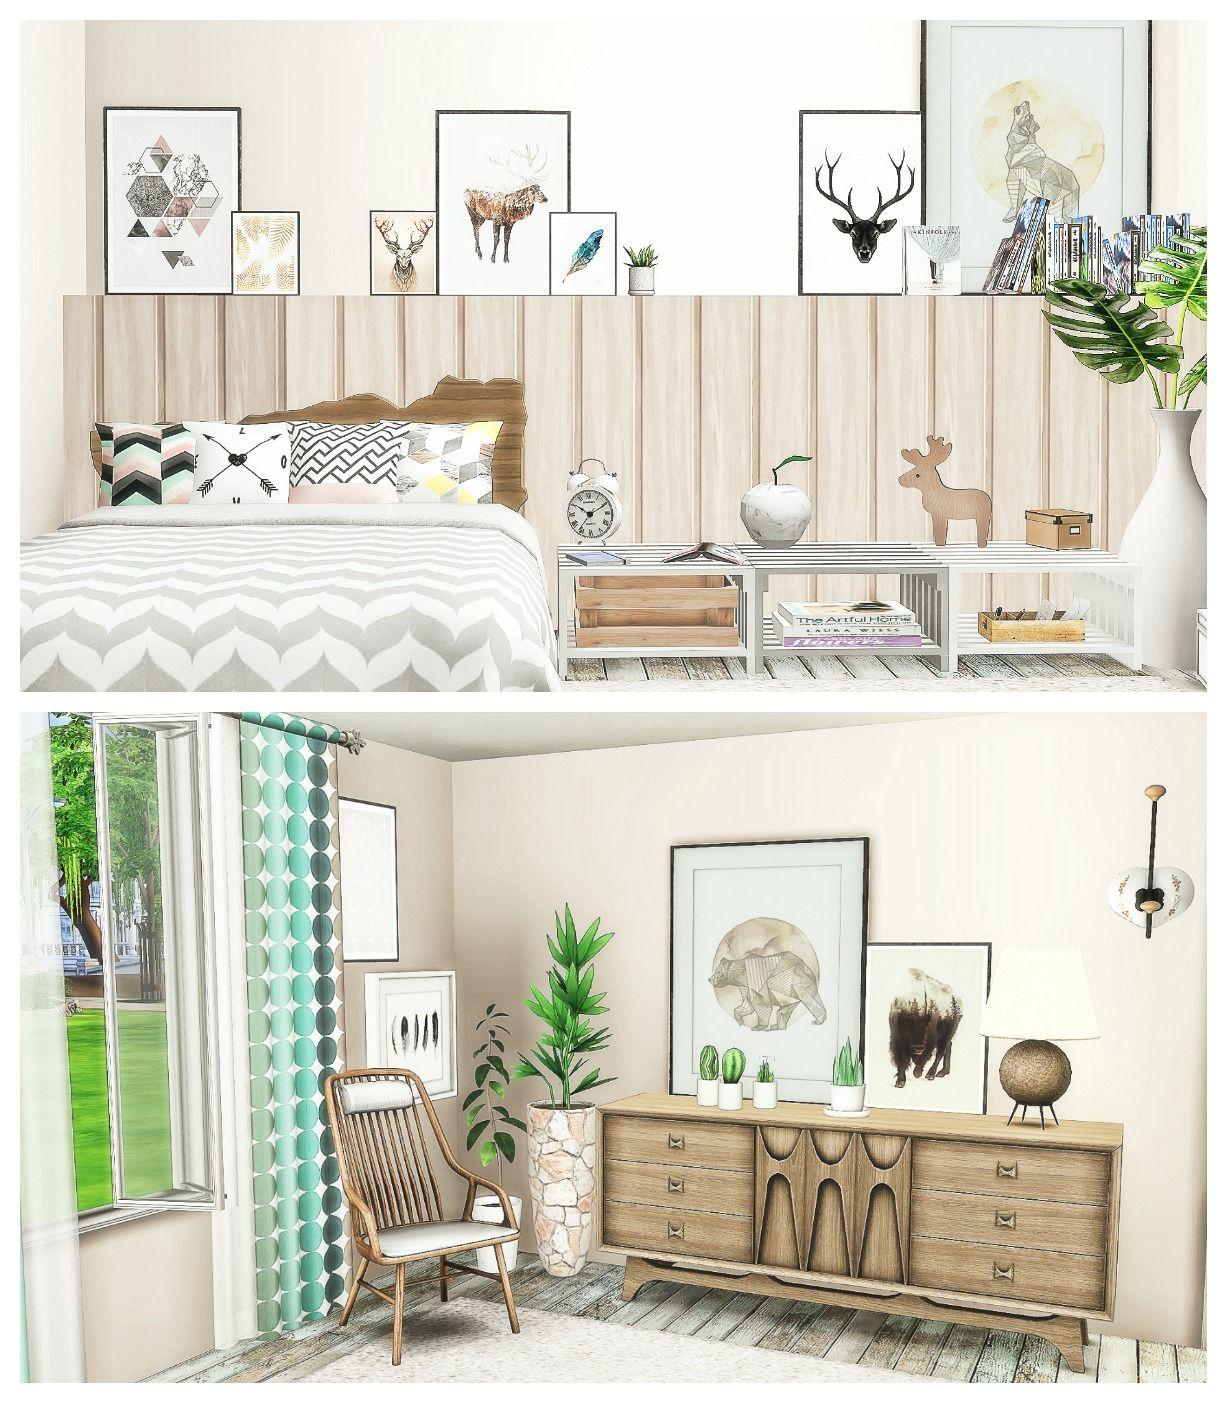 scandinavian bedroom sims 4 decoration sims cc pinterest scandinavian bedroom sims 4 decoration